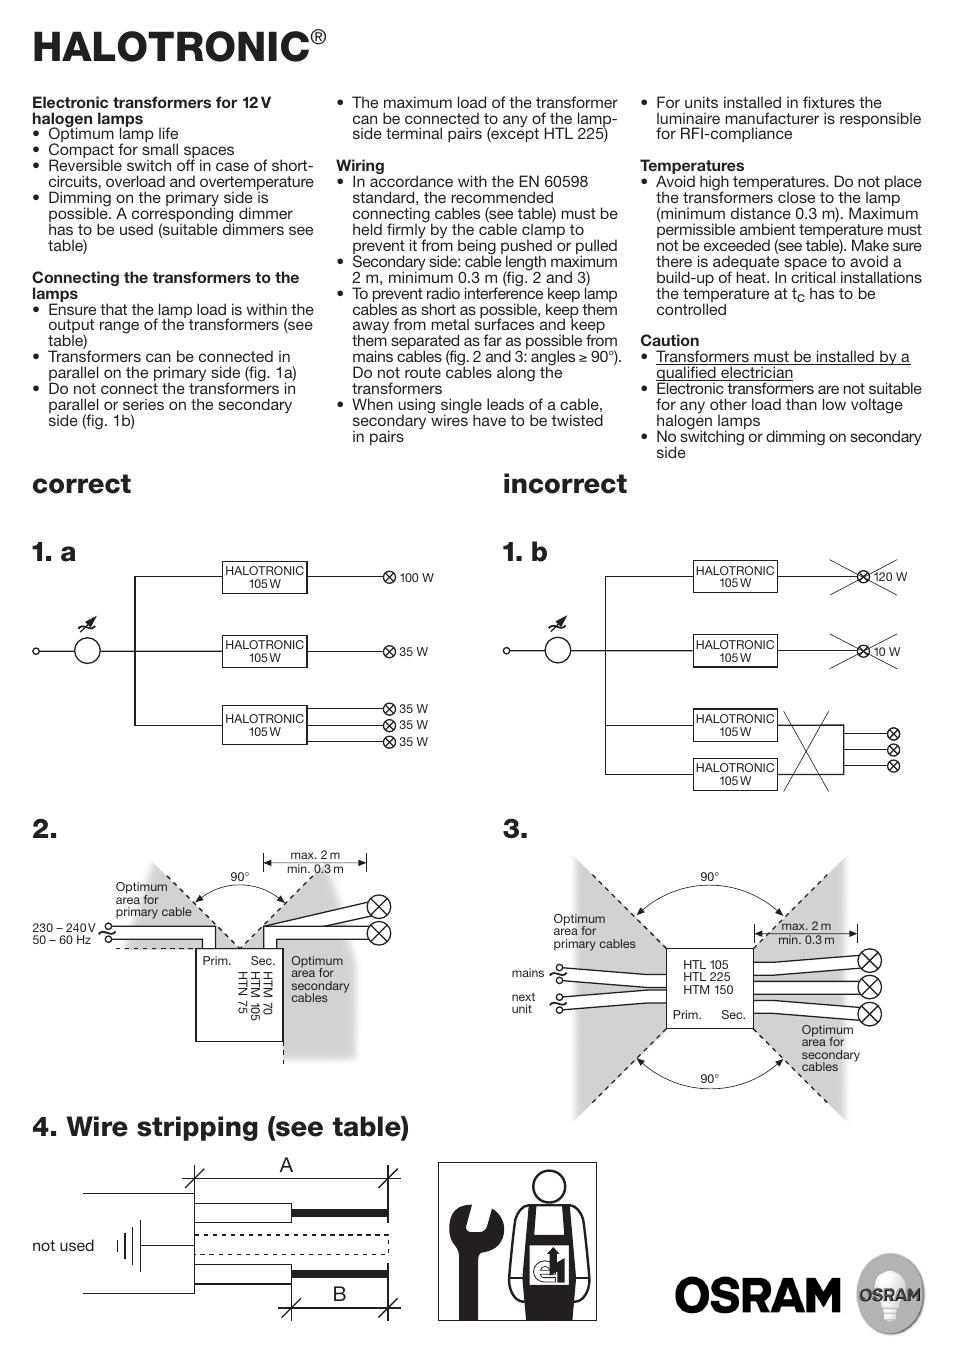 OSRAM HALOTRONIC-COMPACT